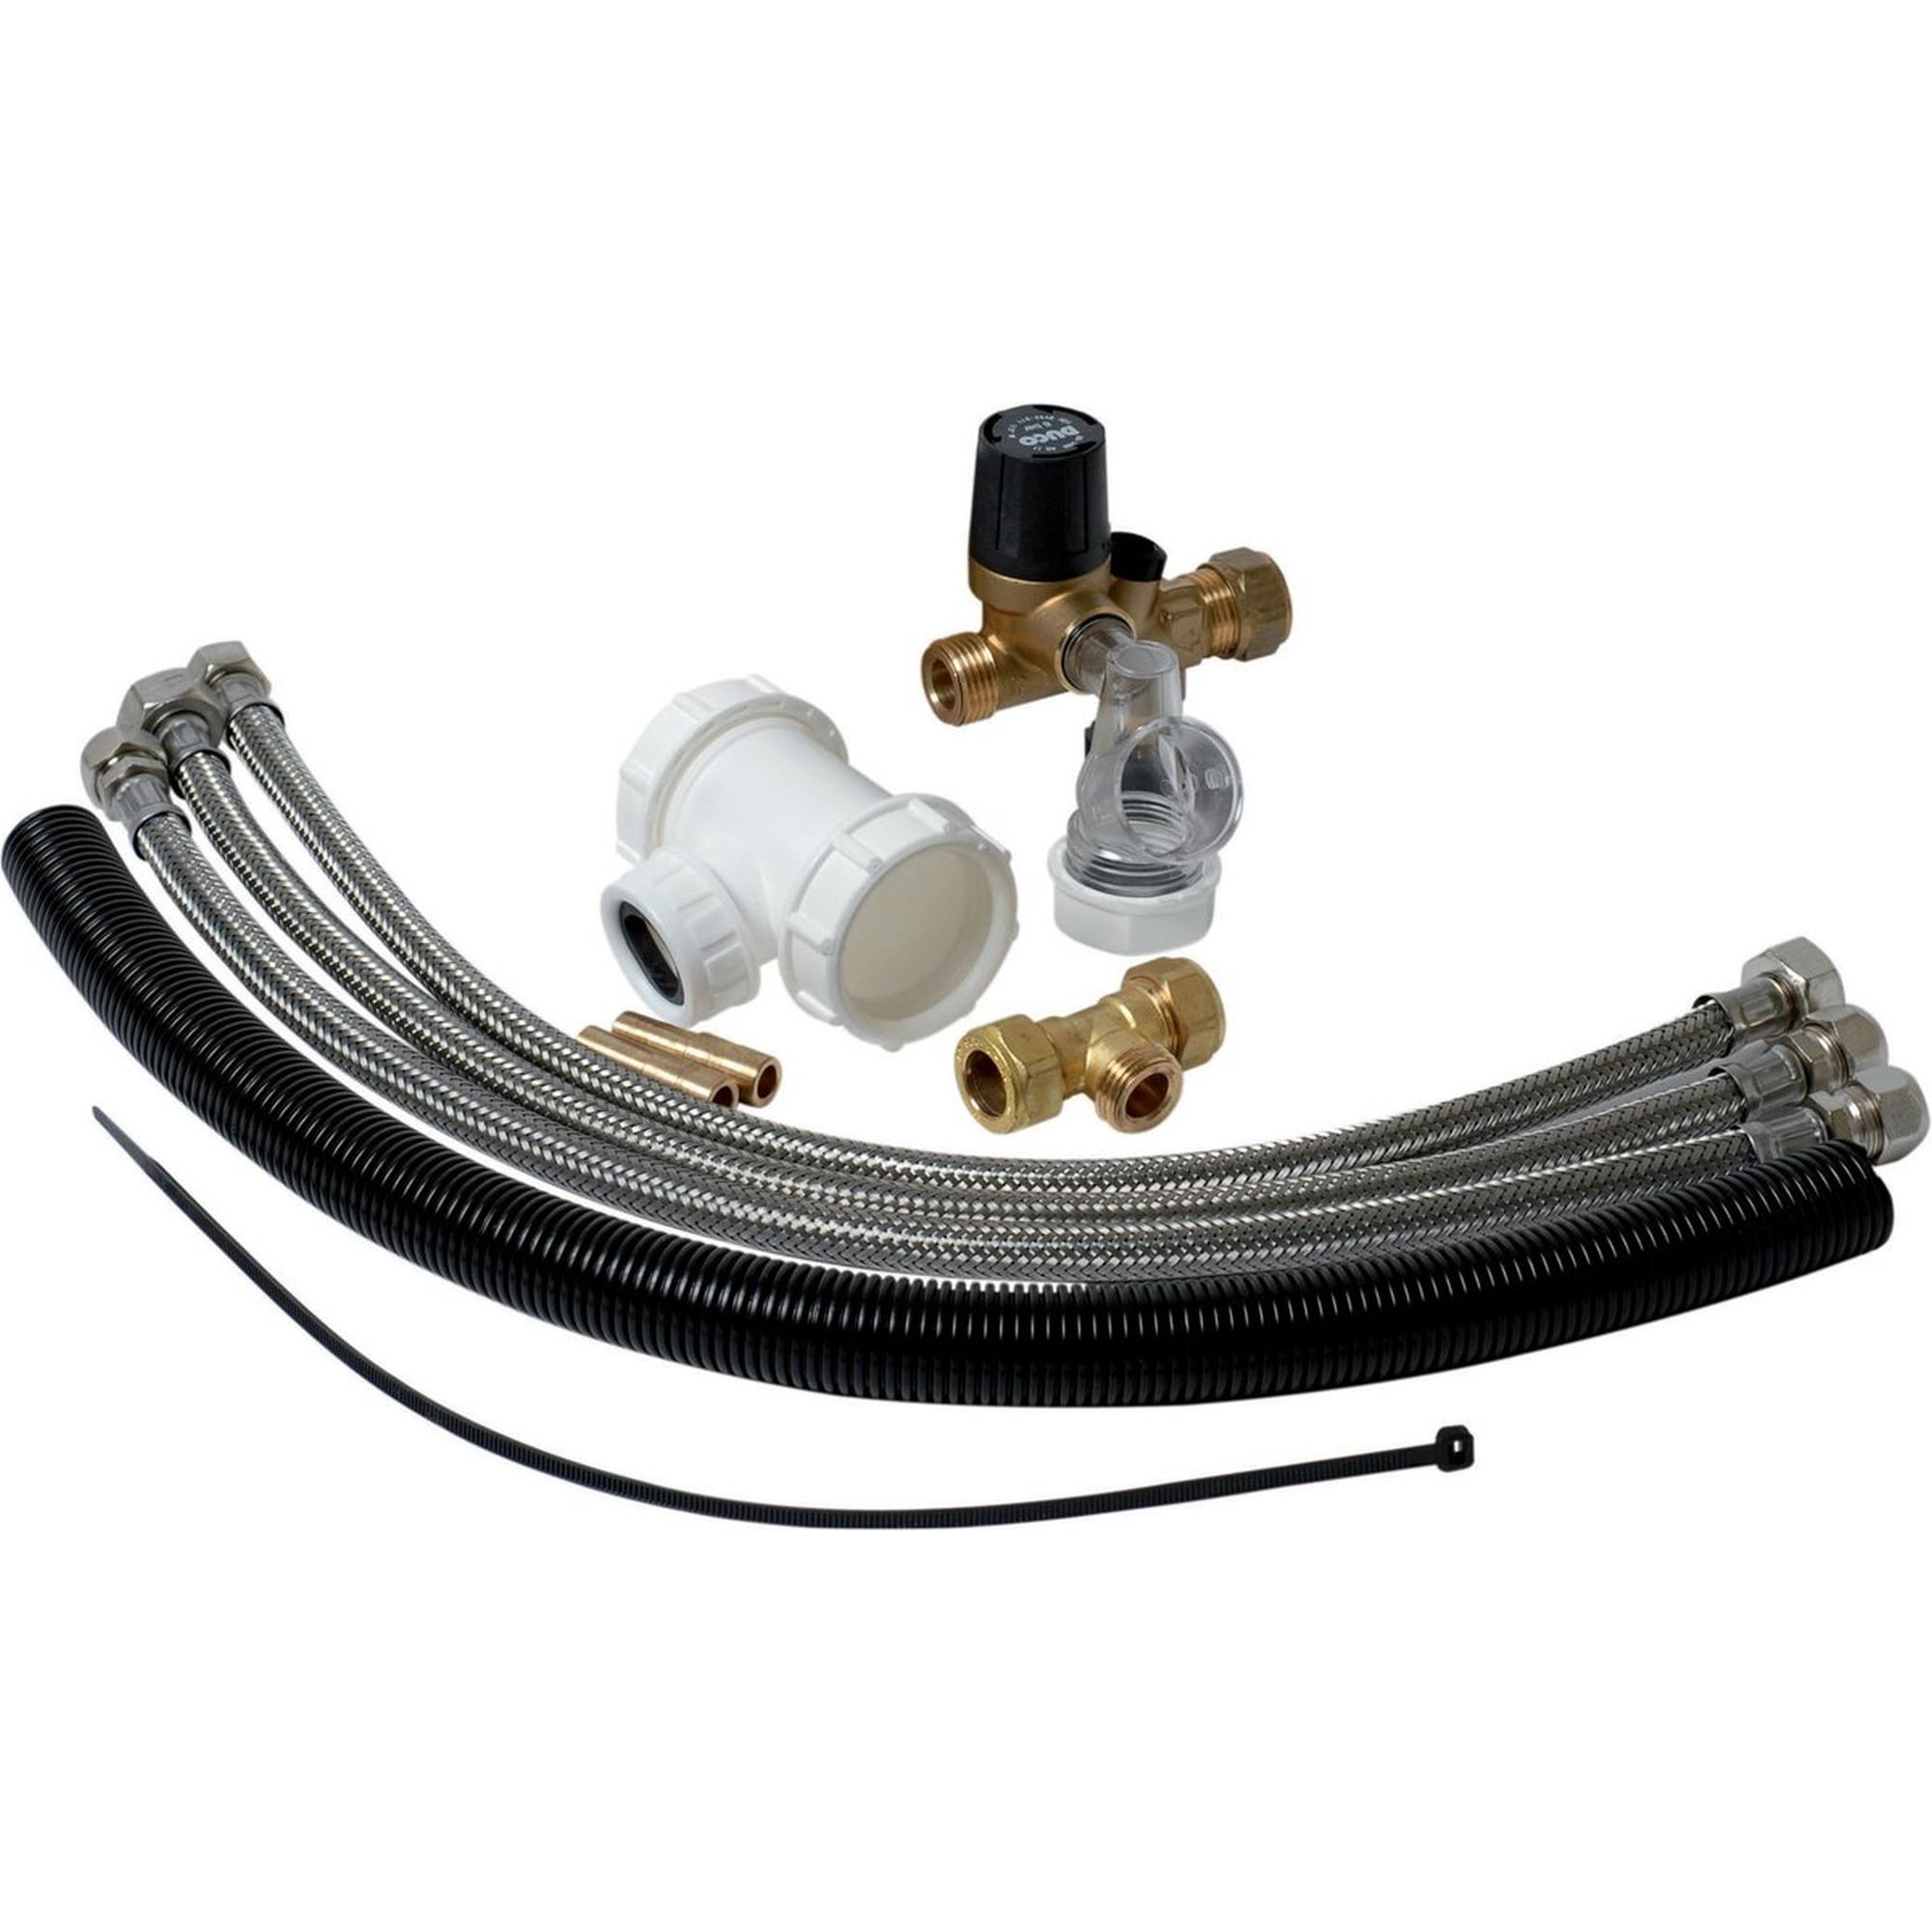 Plieger boileraansluitset tbv. 12 mm aansluiting